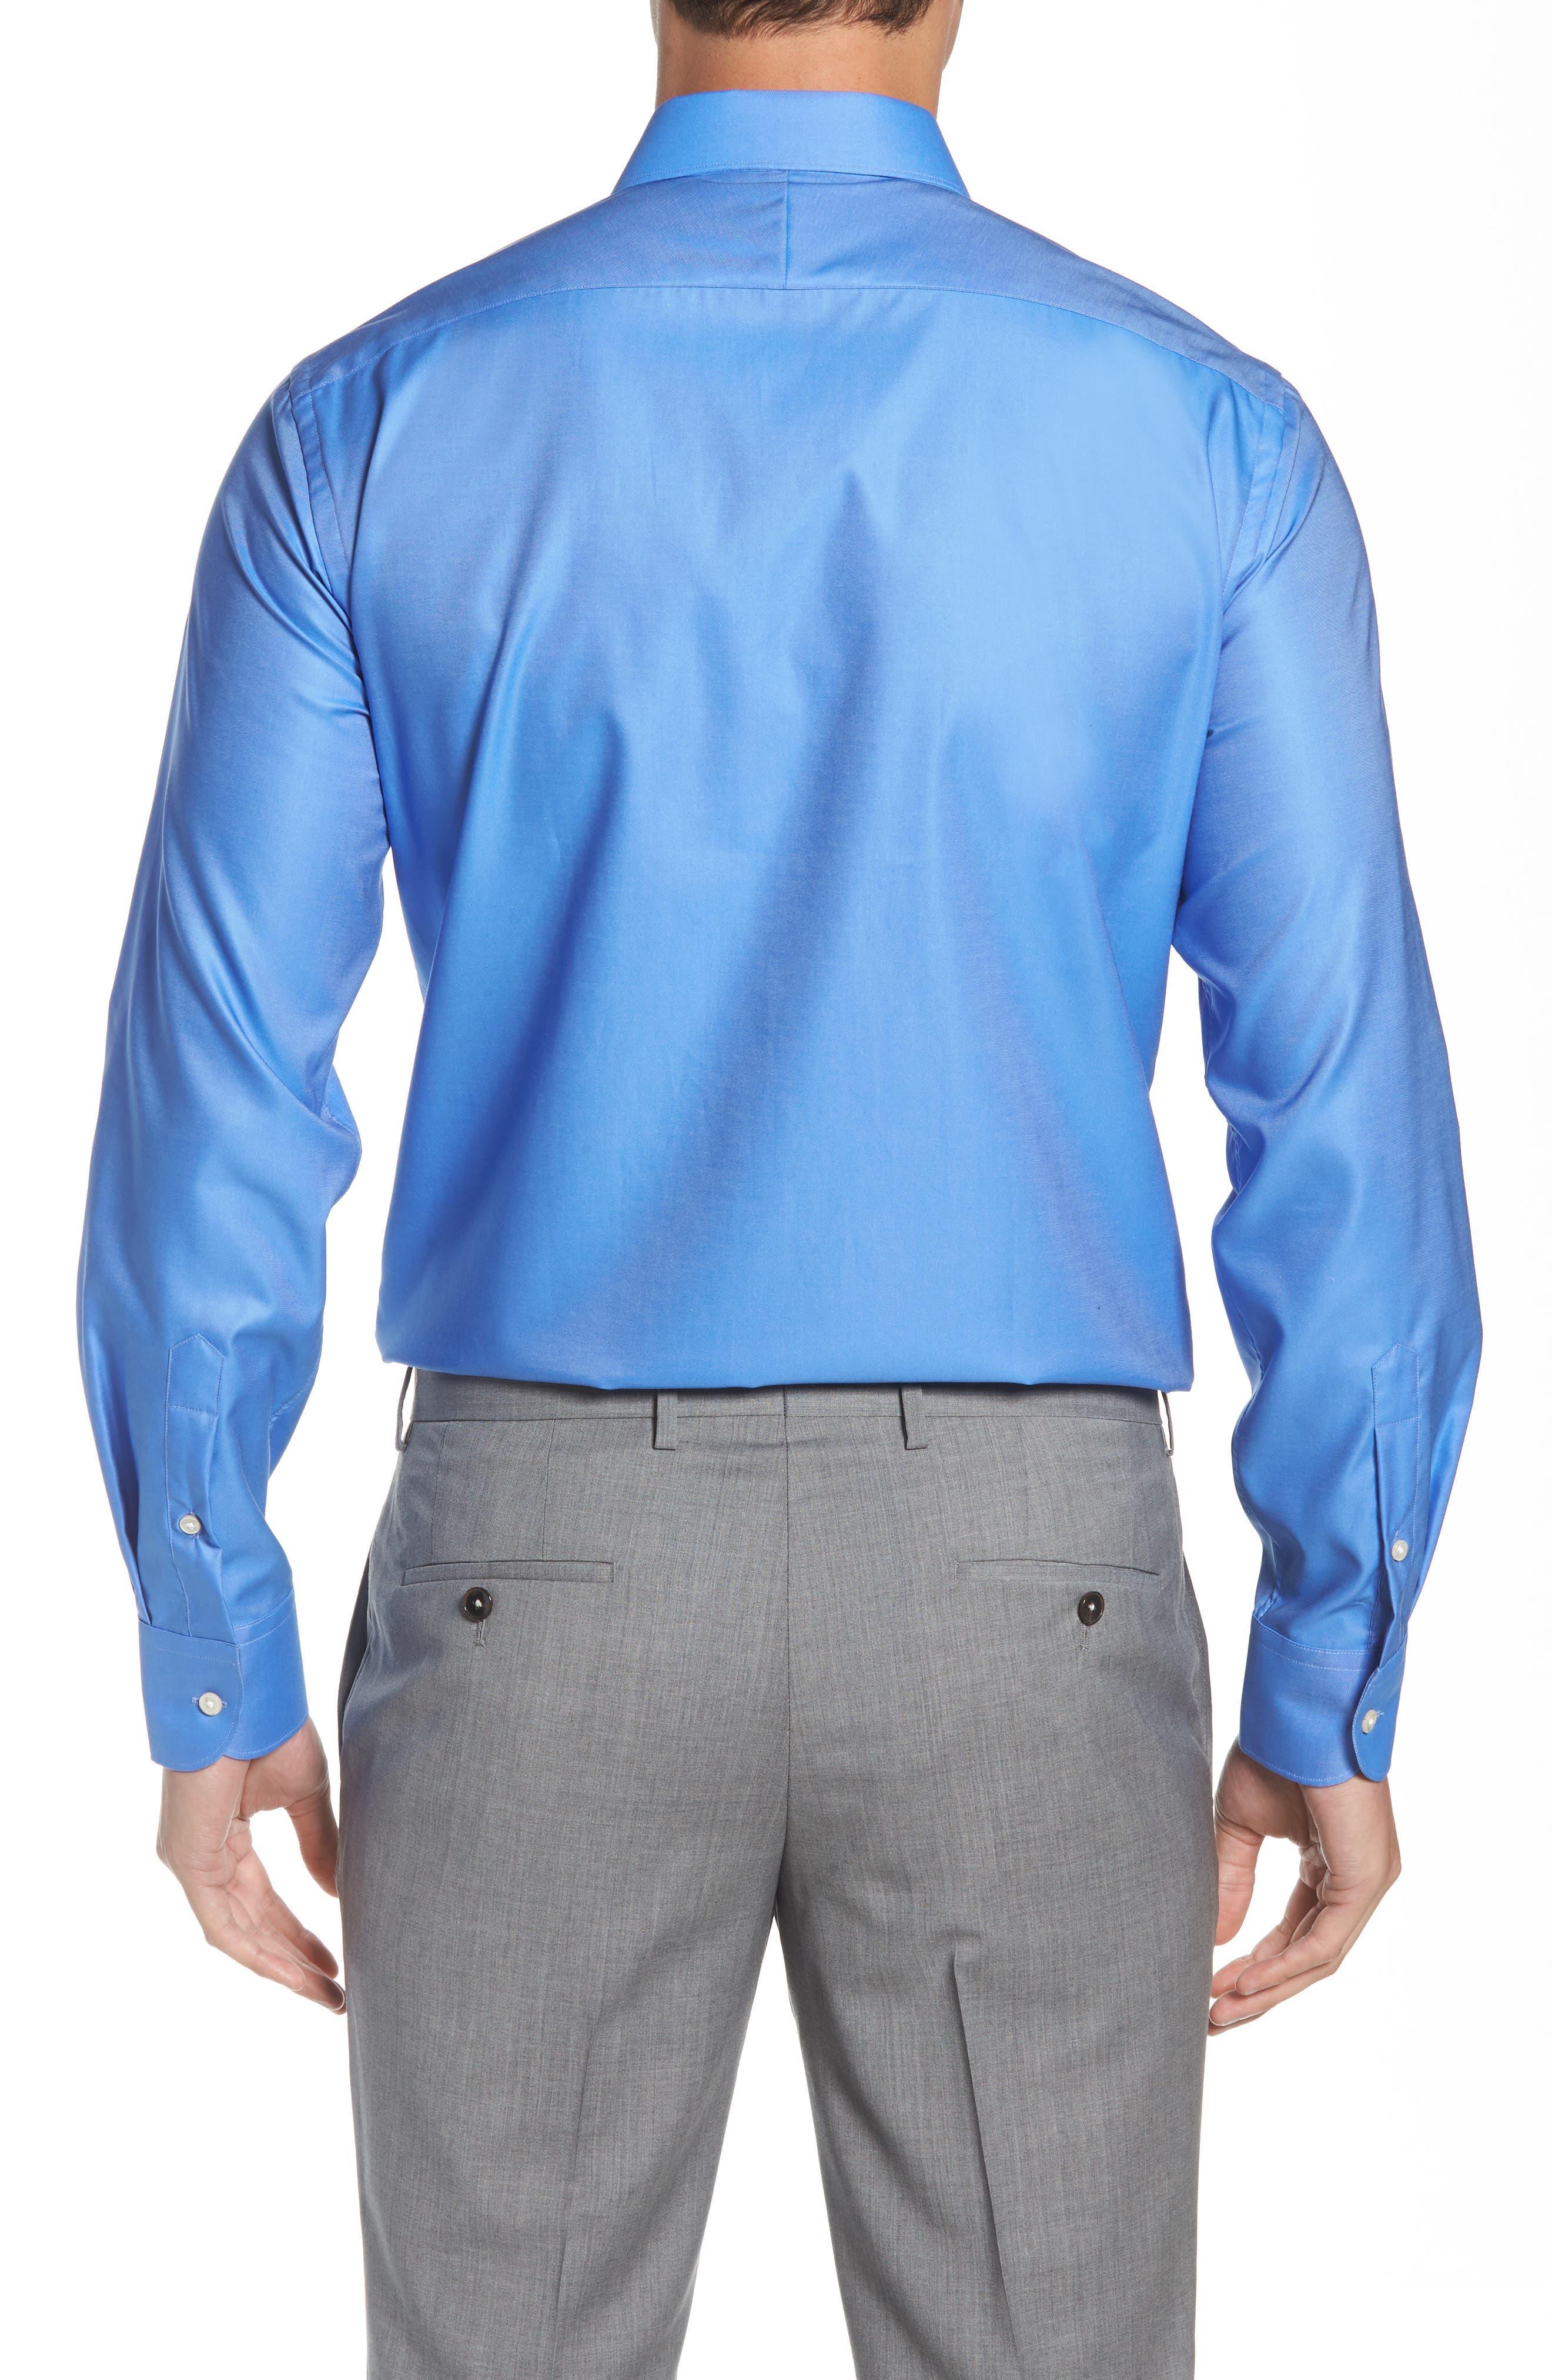 Regular Fit Solid Dress Shirt,                             Alternate thumbnail 3, color,                             DARK BLUE